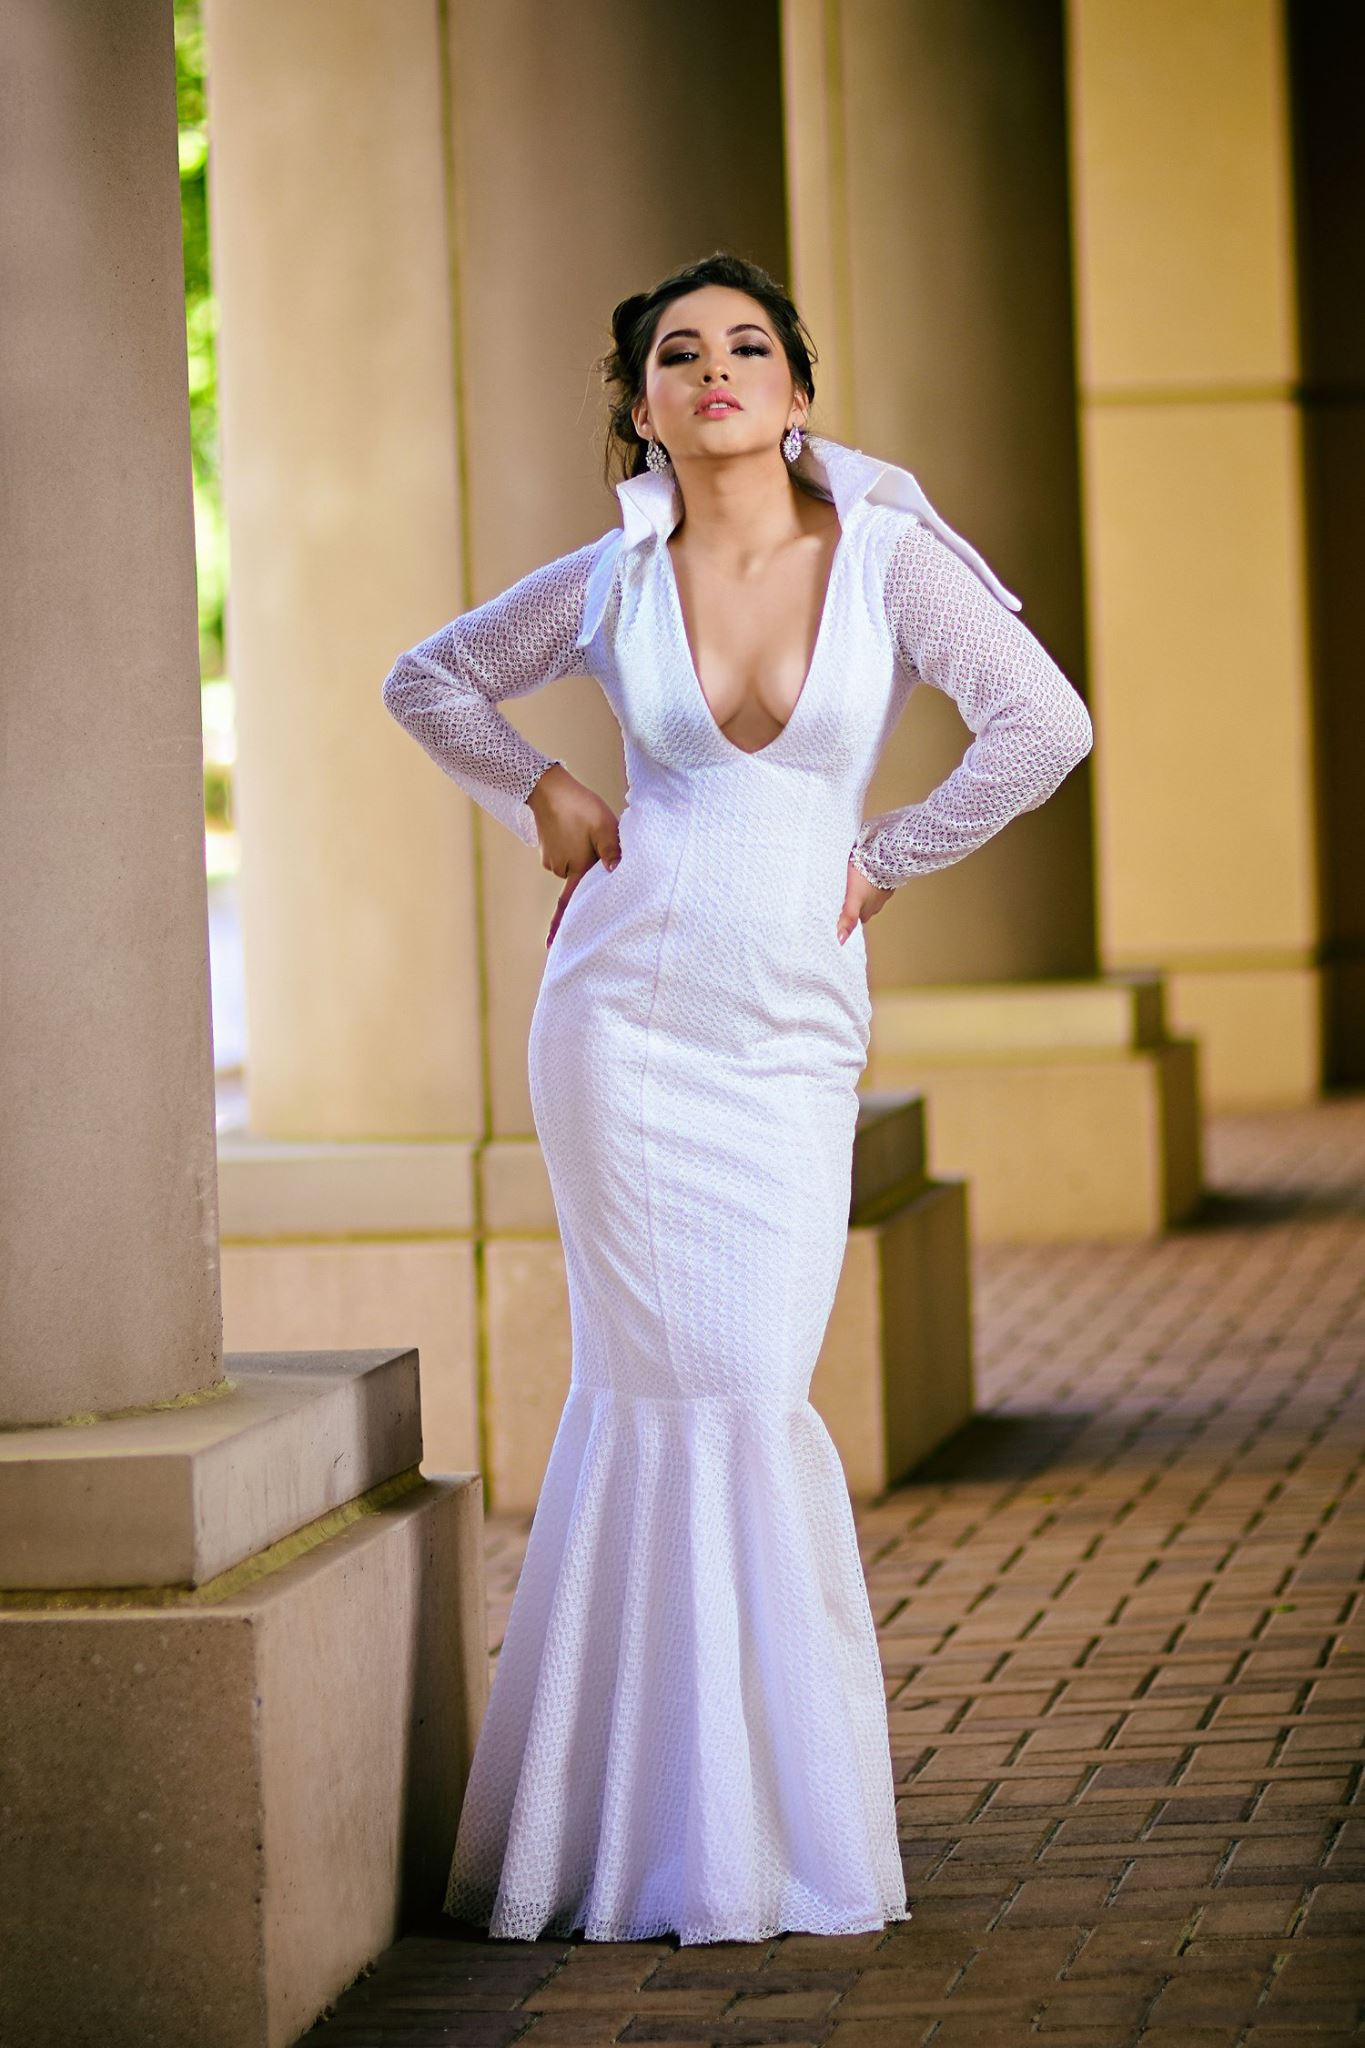 Photographer: Olivia Garcia  Model: Jennifer Castillo